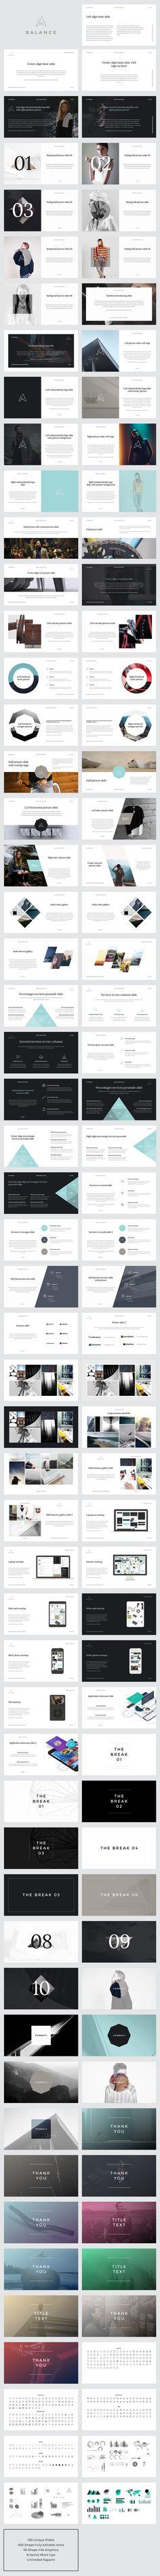 BALANCE PowerPoint Presentation - Presentations - 3